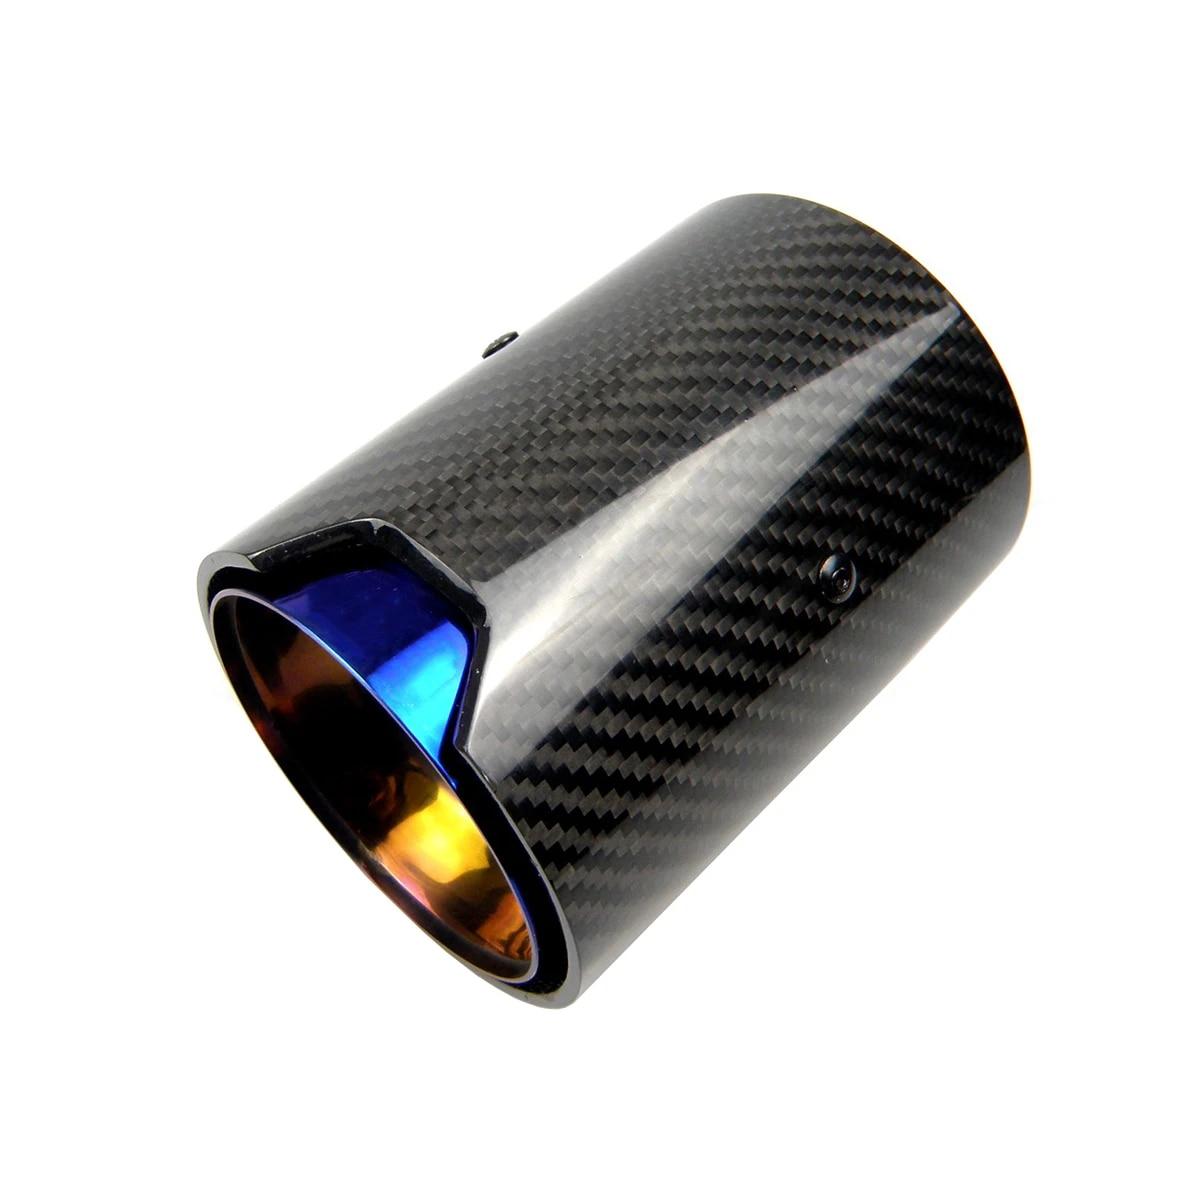 1pcs real carbon fiber blue exhaust pipe muffler tip for bmw m performance exhaust m2 f87 m3 f80 m4 f82 f83 m5 f10 m6 f12 f13